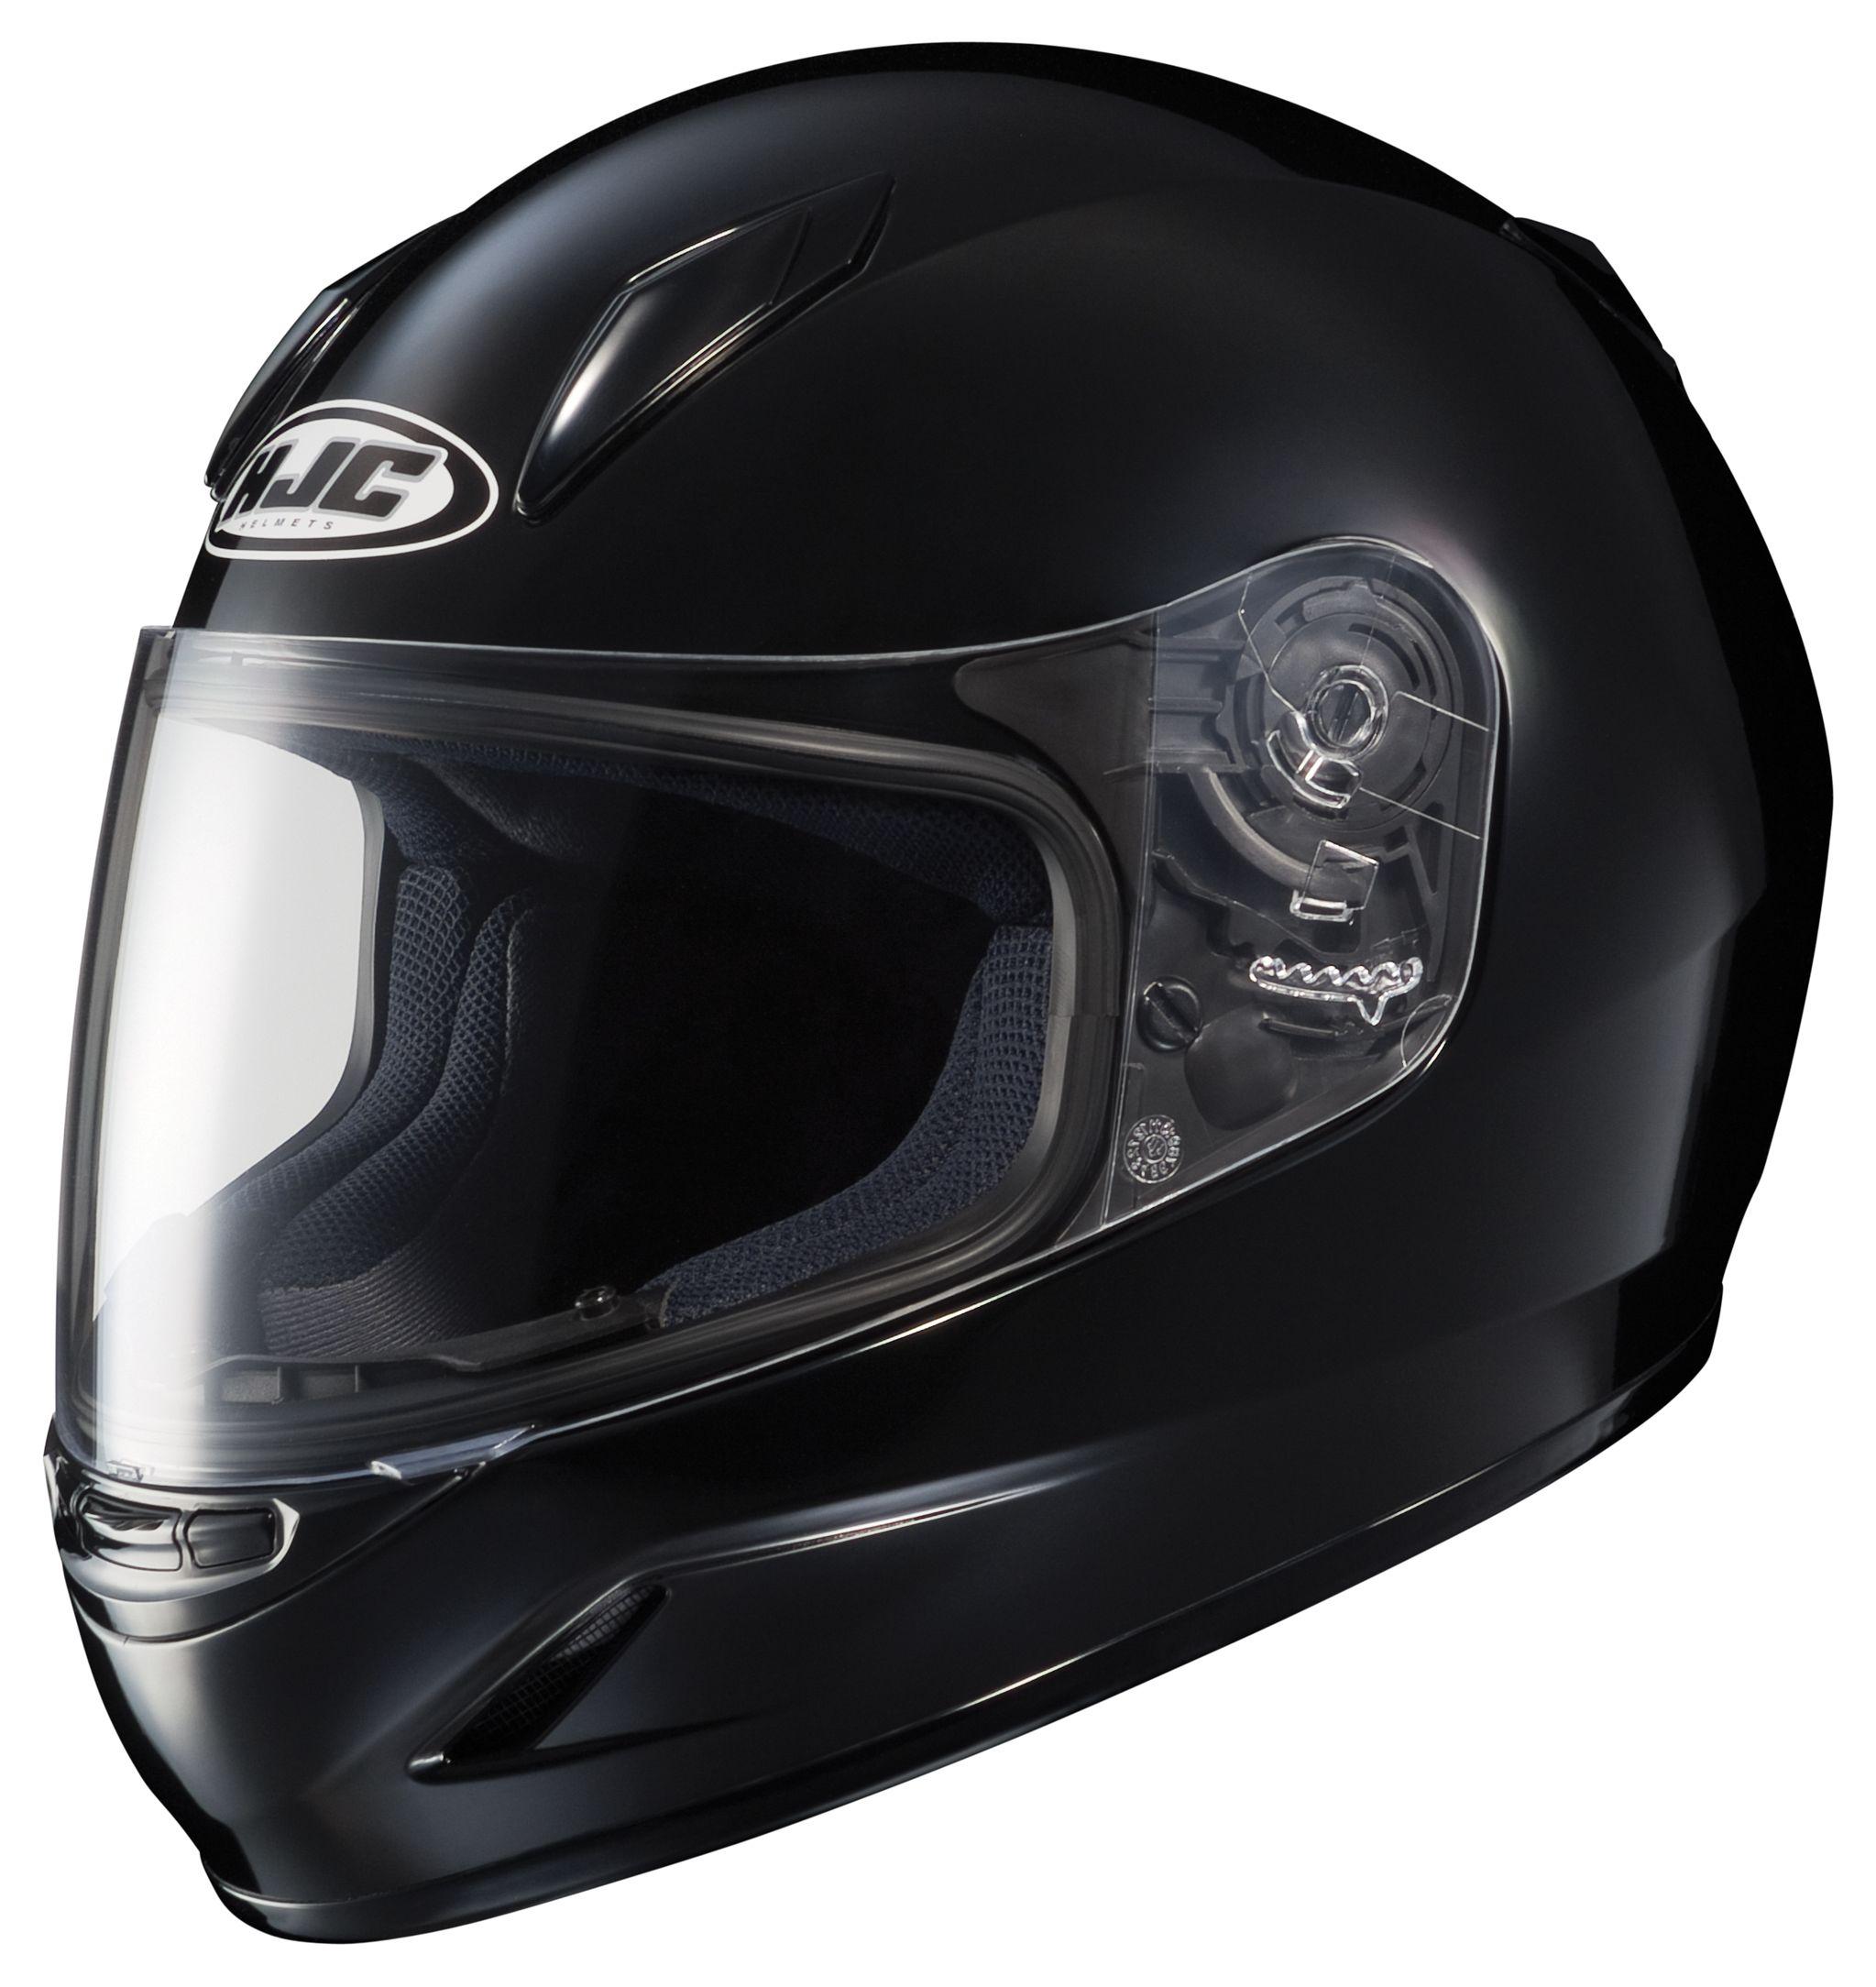 HJC CL Y Youth Helmet Solid RevZilla : CLYBlack <strong>Lightweight Modular</strong> Motorcycle Helmets from www.revzilla.com size 2047 x 2168 jpeg 248kB